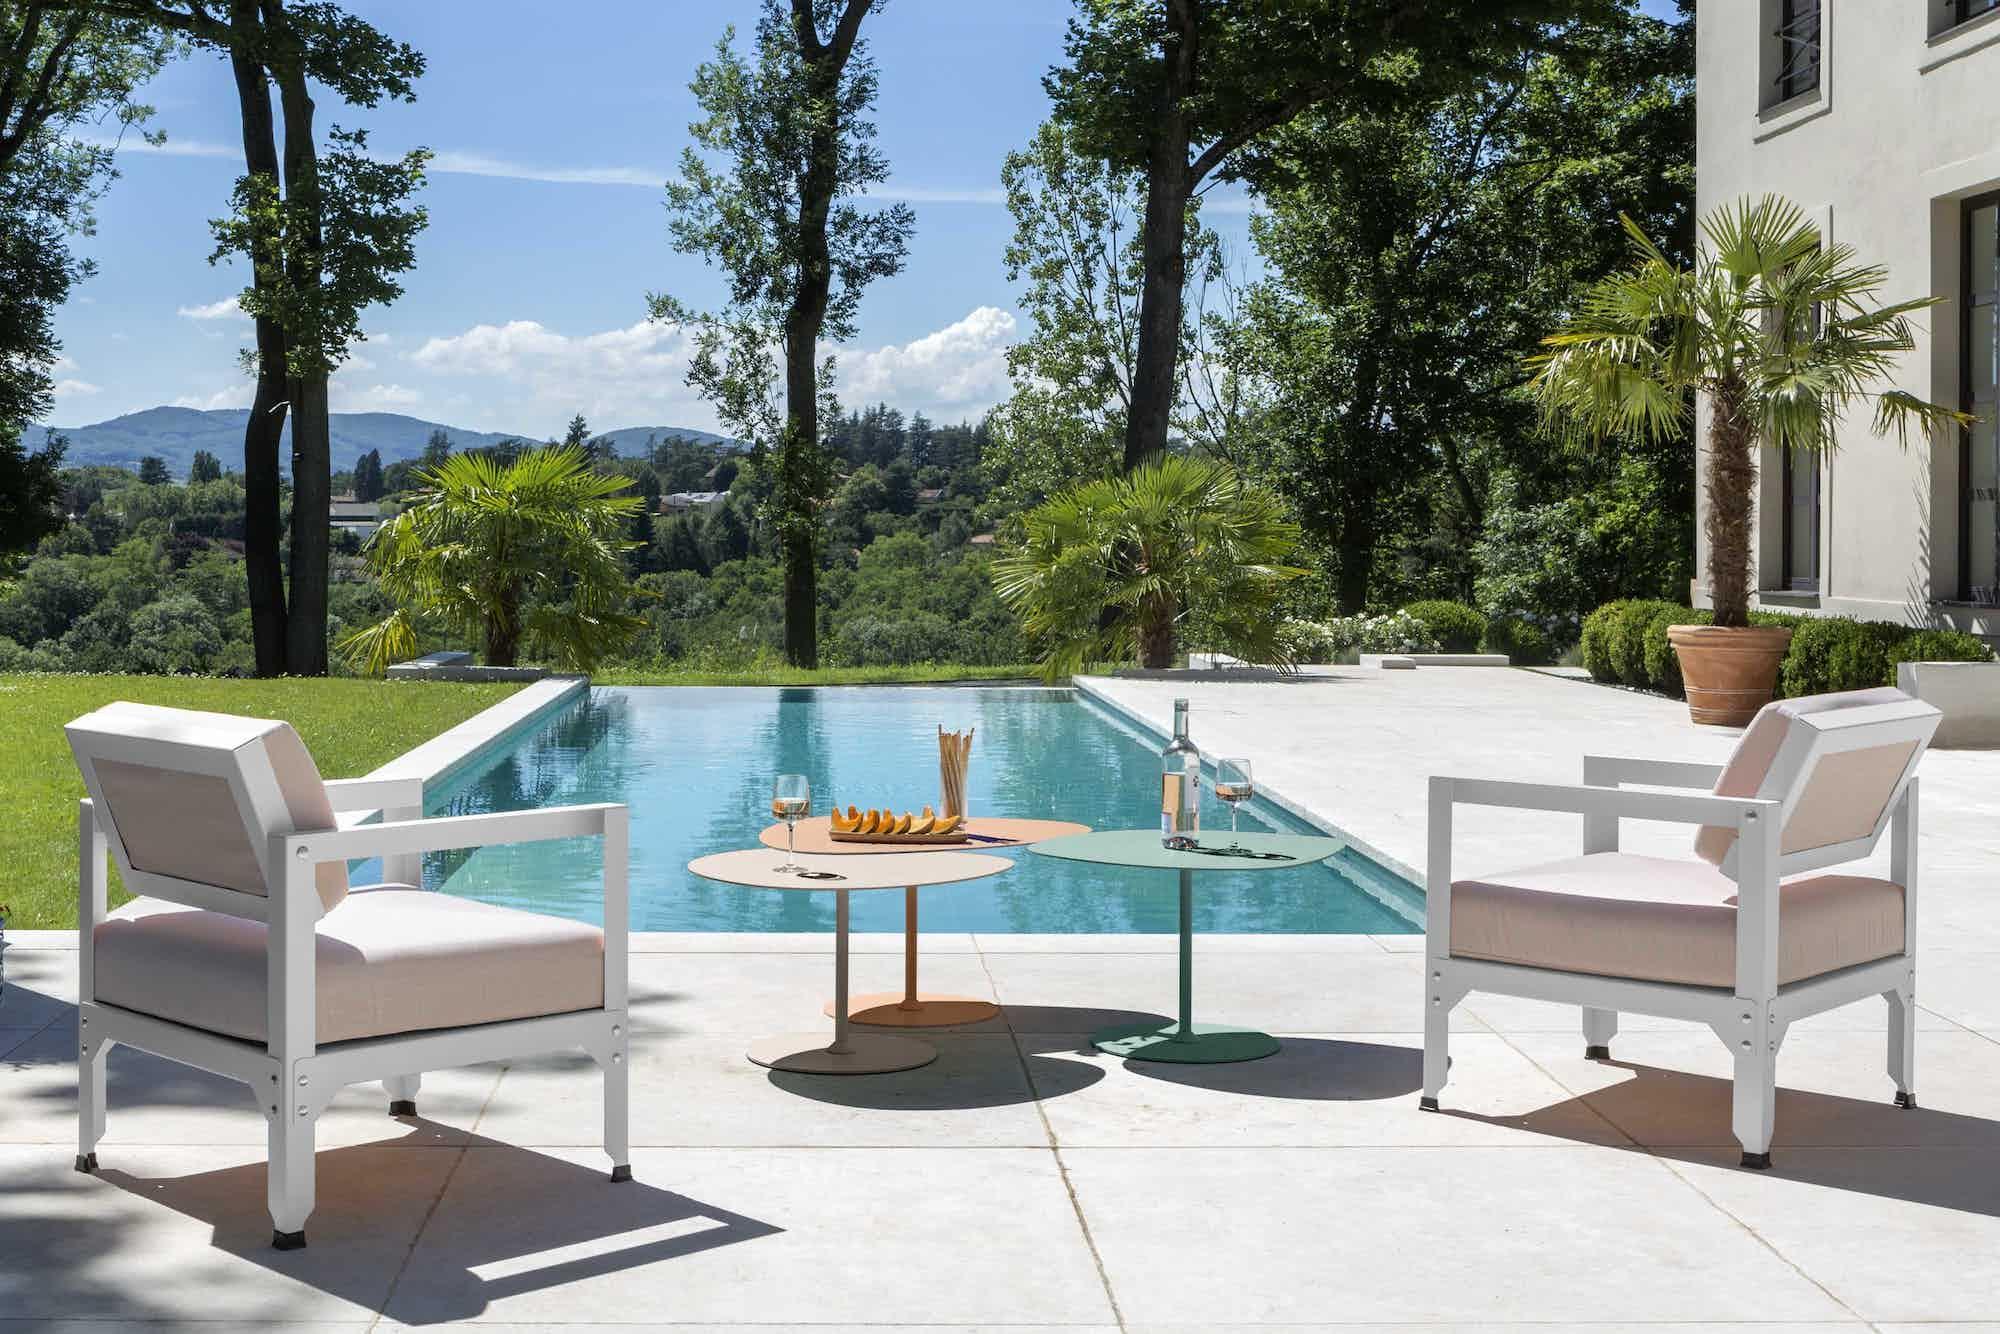 Matiere grise luc jozancy hegoa fauteuil exterieur salon jardin terrasse